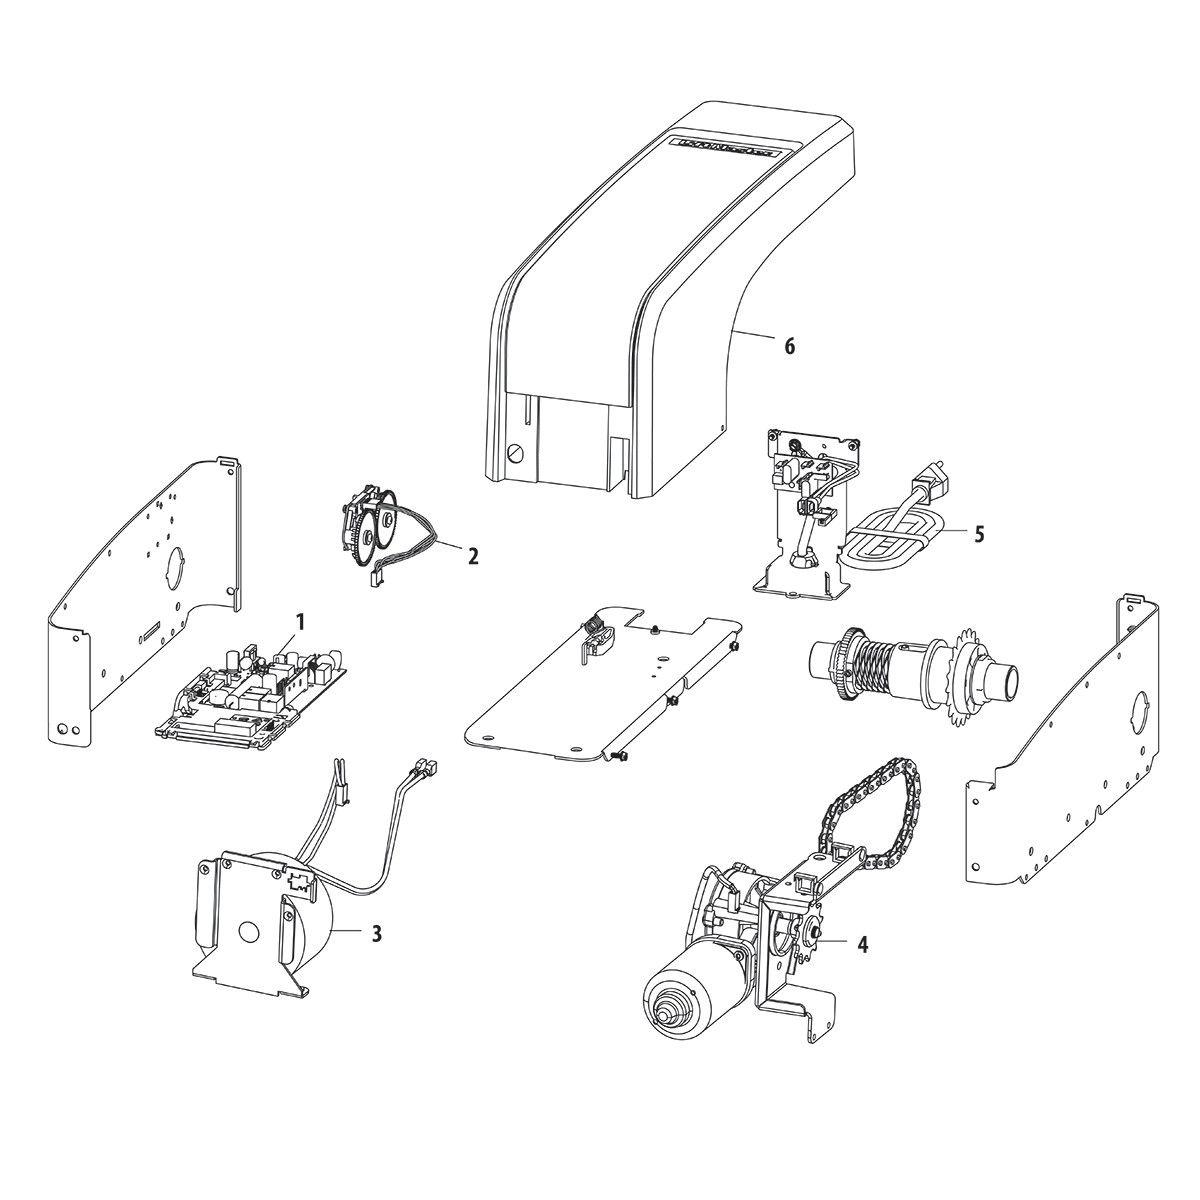 LiftMaster 8500W Wall Mount Garage Door Opener | LiftMaster